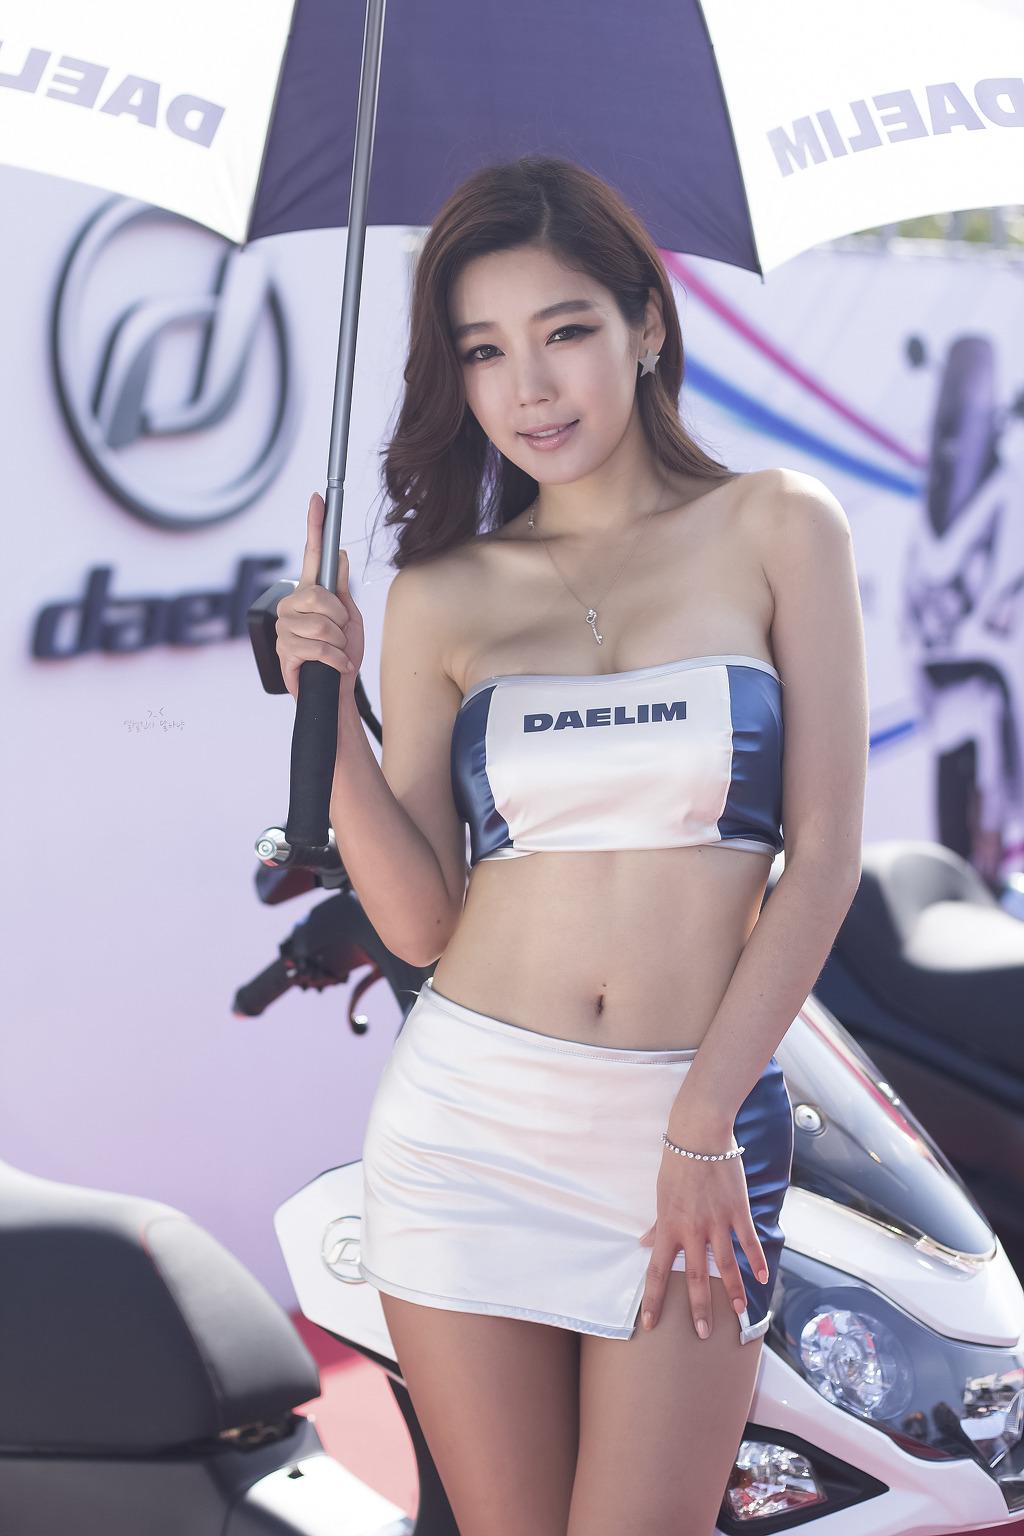 xxx nude girls: Chevy Malibu Event: Lee Sung Hwa